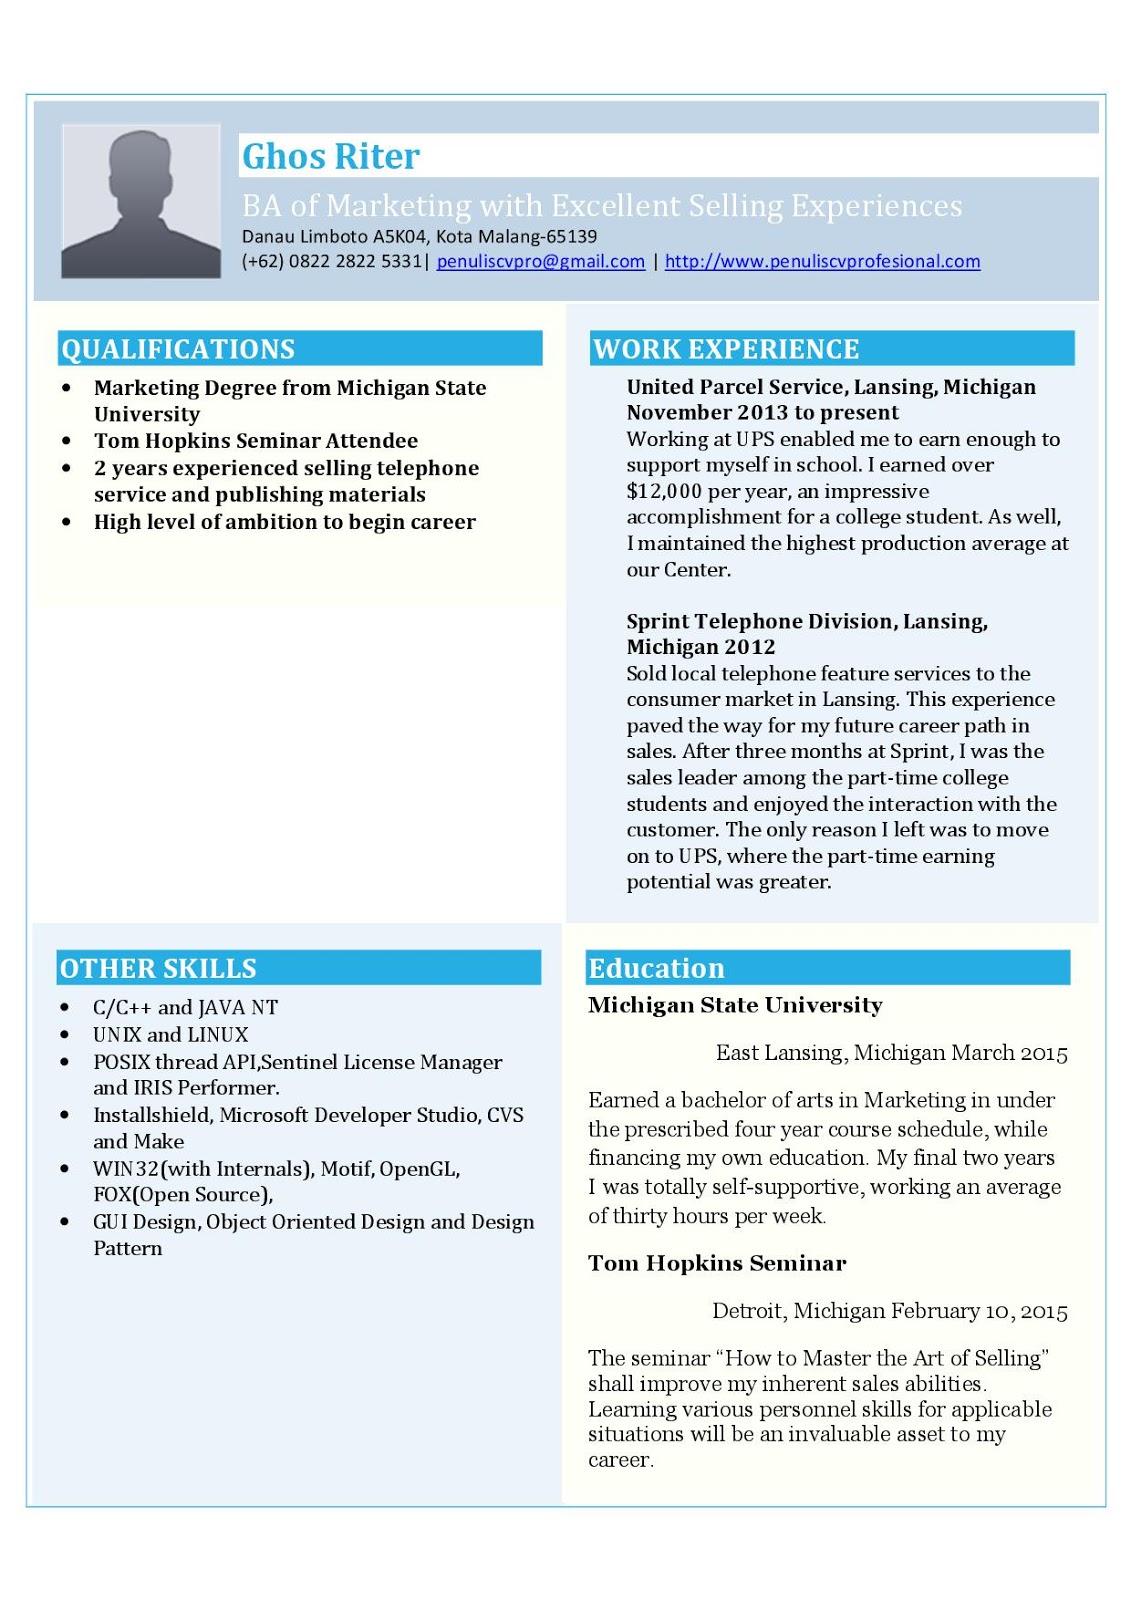 contoh resume  curriculum vitae sarjana baru lulus yang